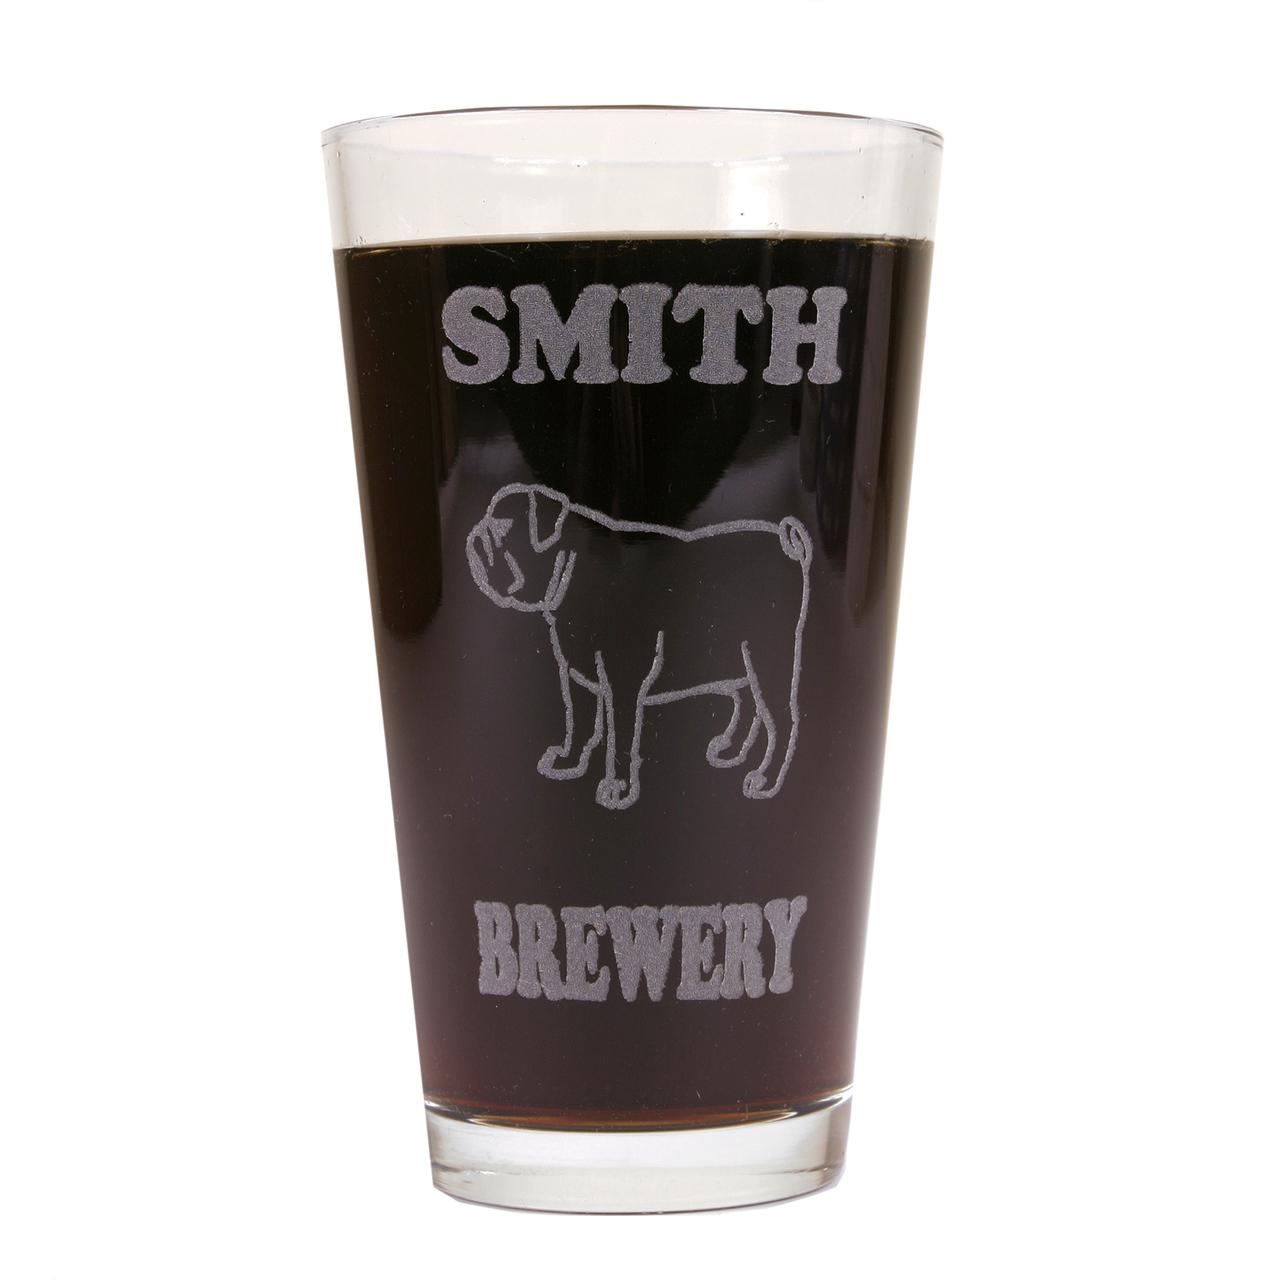 Hot Dog Personalized Pint Glass Beer Mug - Bulldog